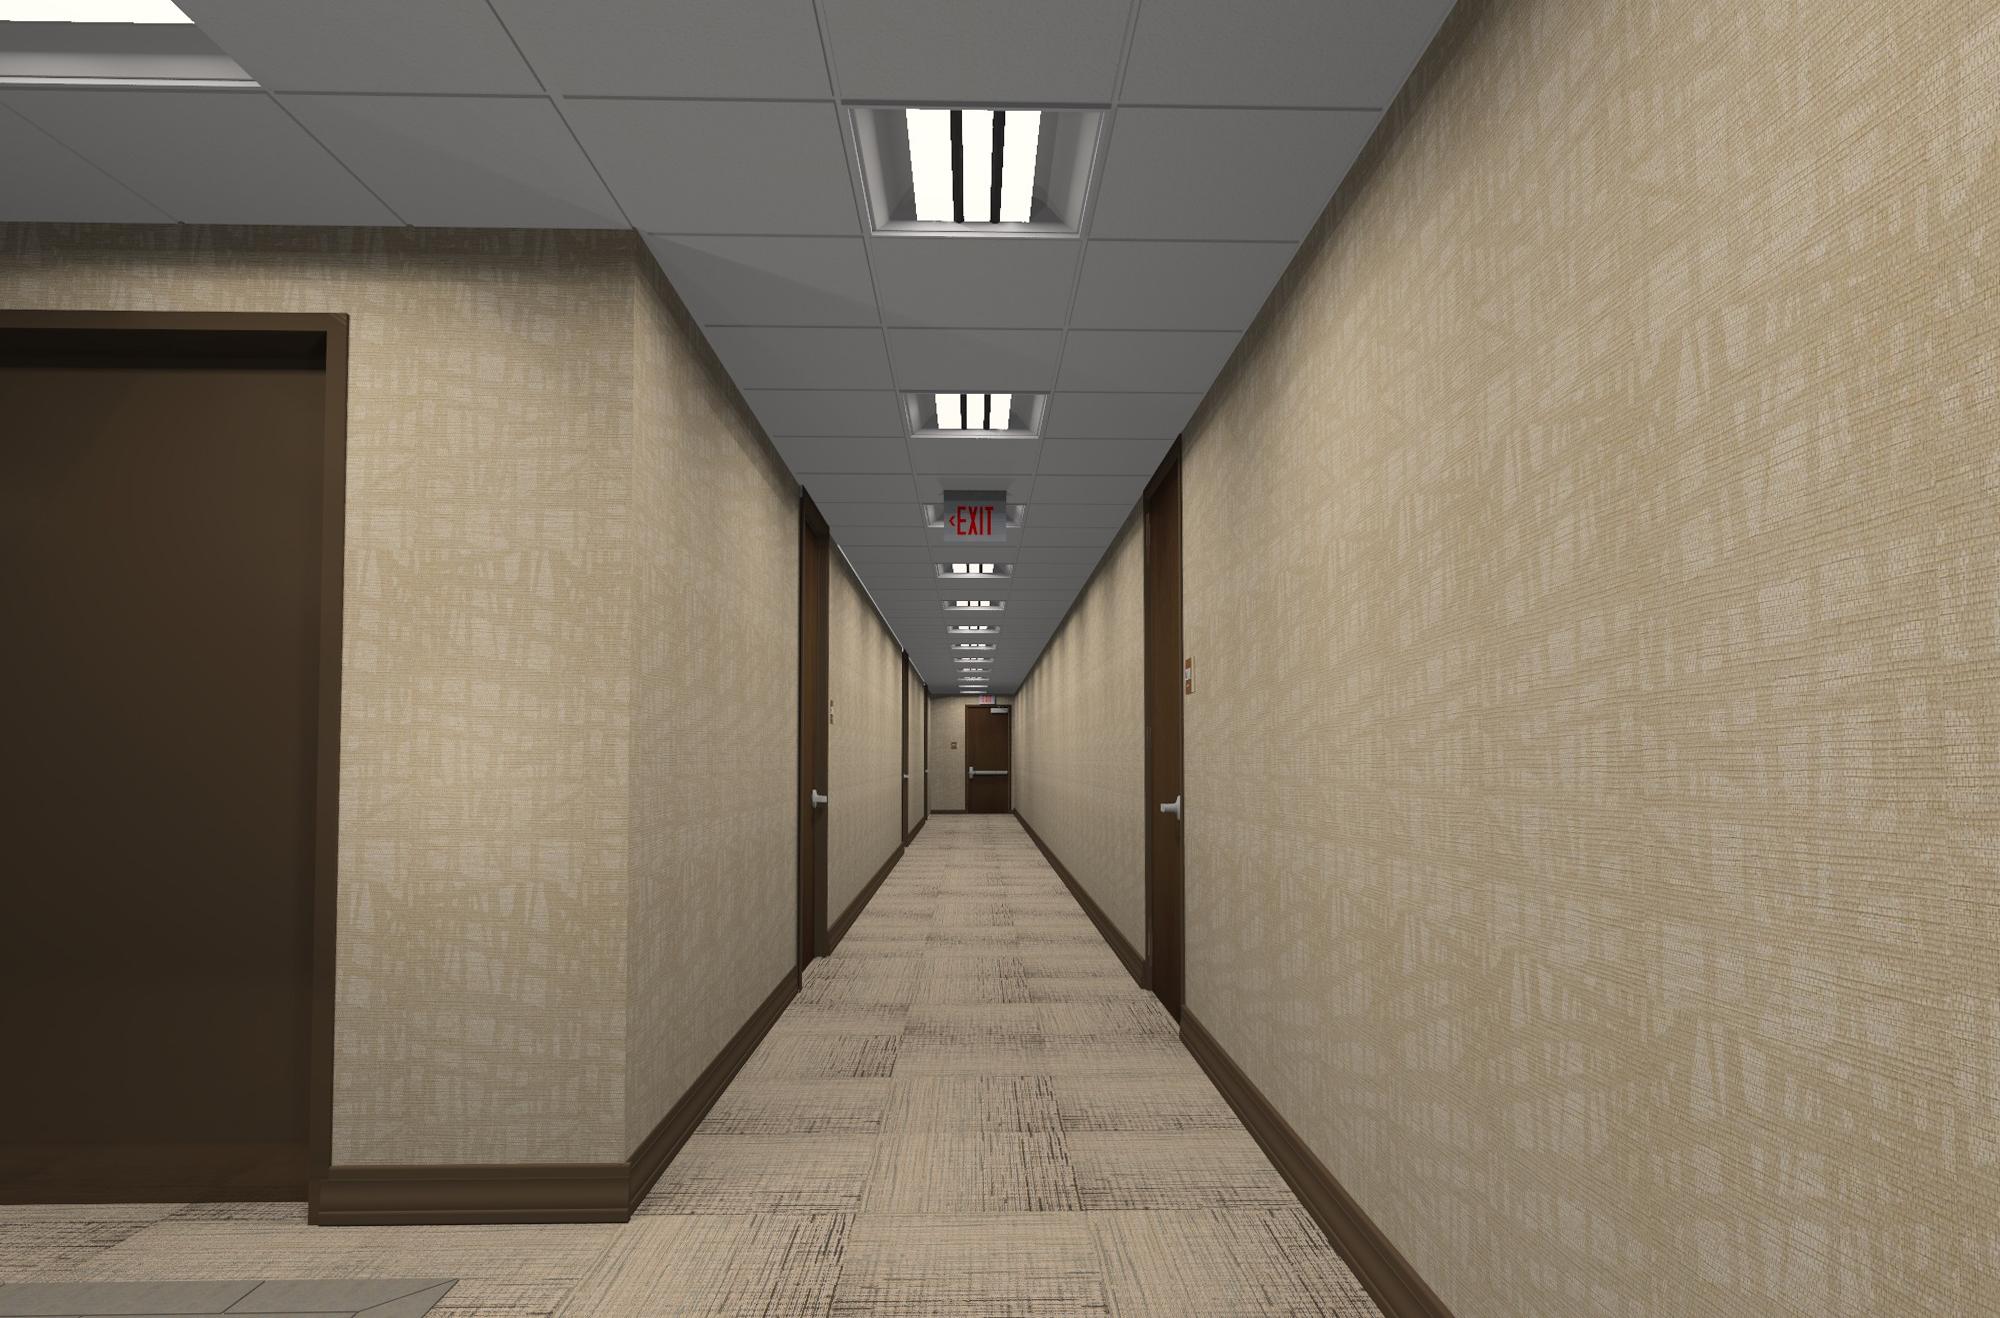 Oakwood Corridor Photoshopped Version